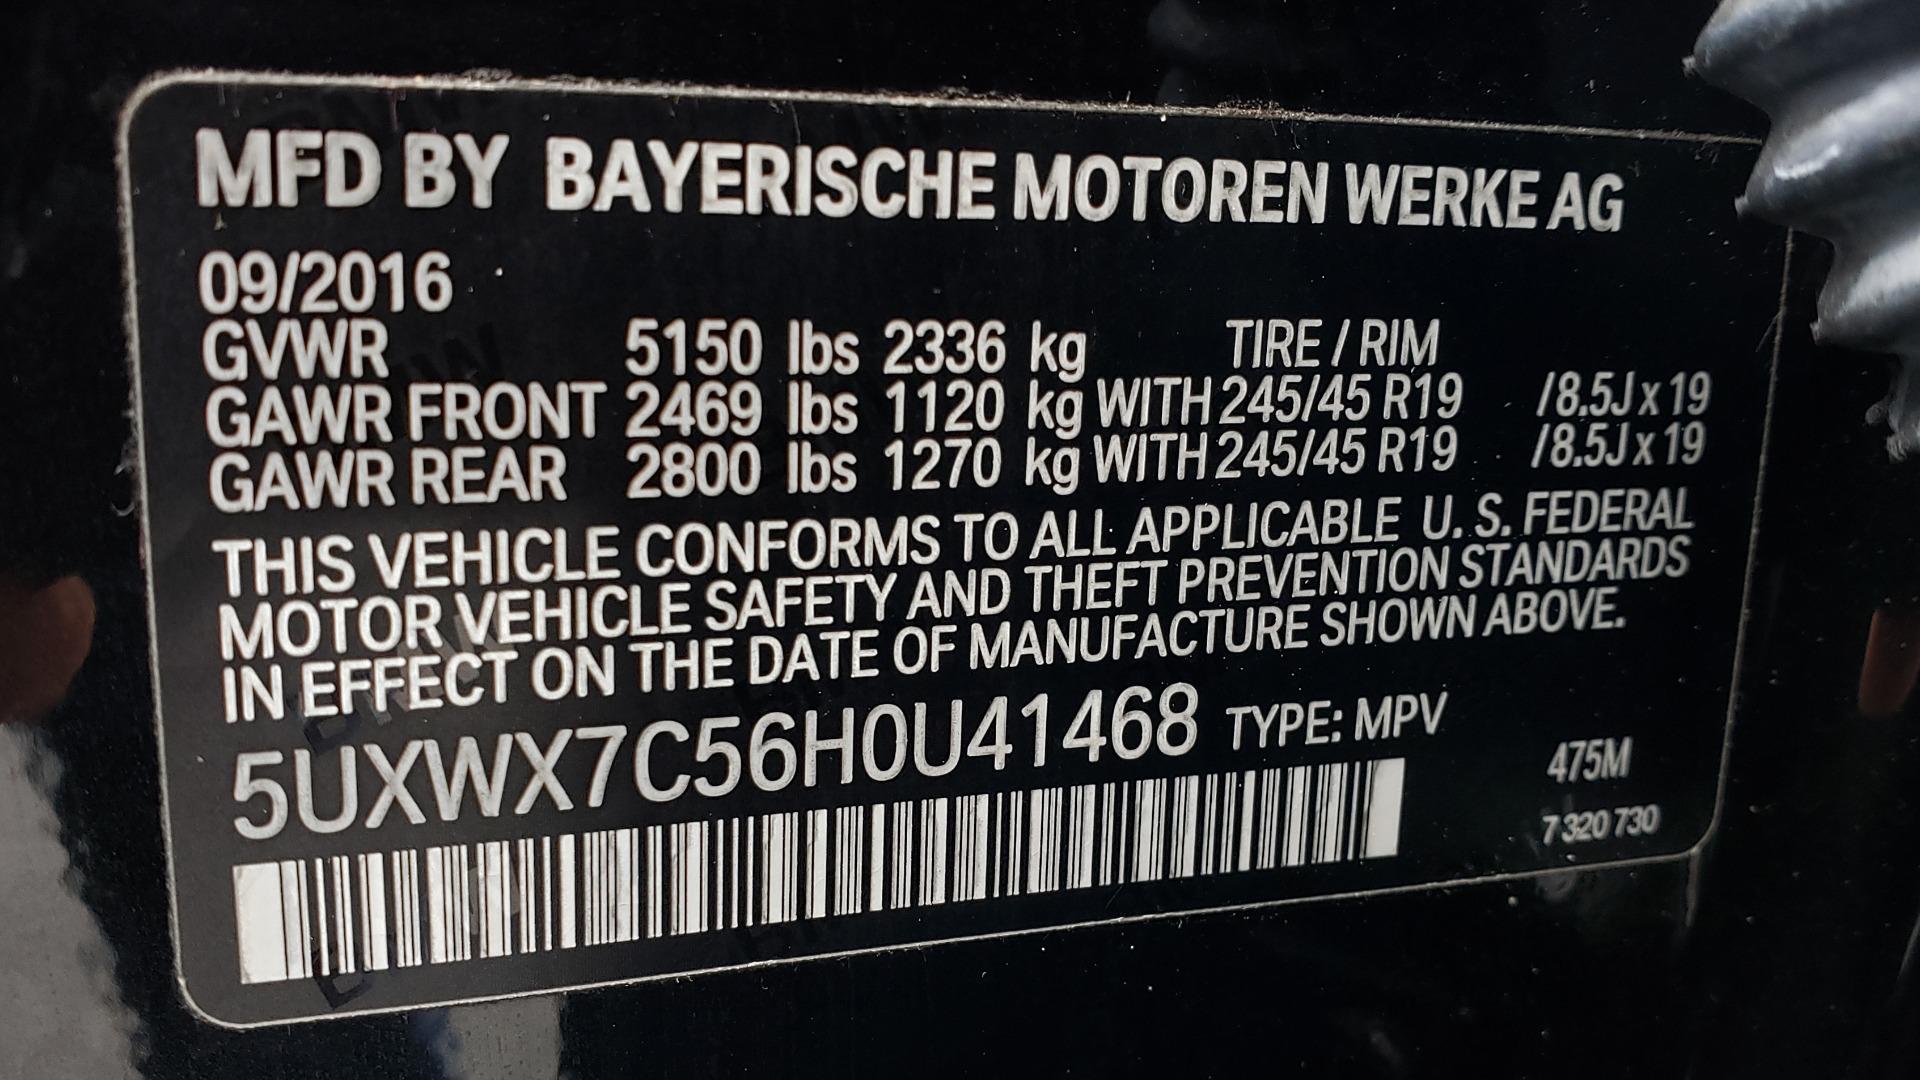 Used 2017 BMW X3 XDRIVE35I M-SPORT / DRVR ASST PLUS / TECHNOLOGY / HUD / BLIND SPOT for sale Sold at Formula Imports in Charlotte NC 28227 83